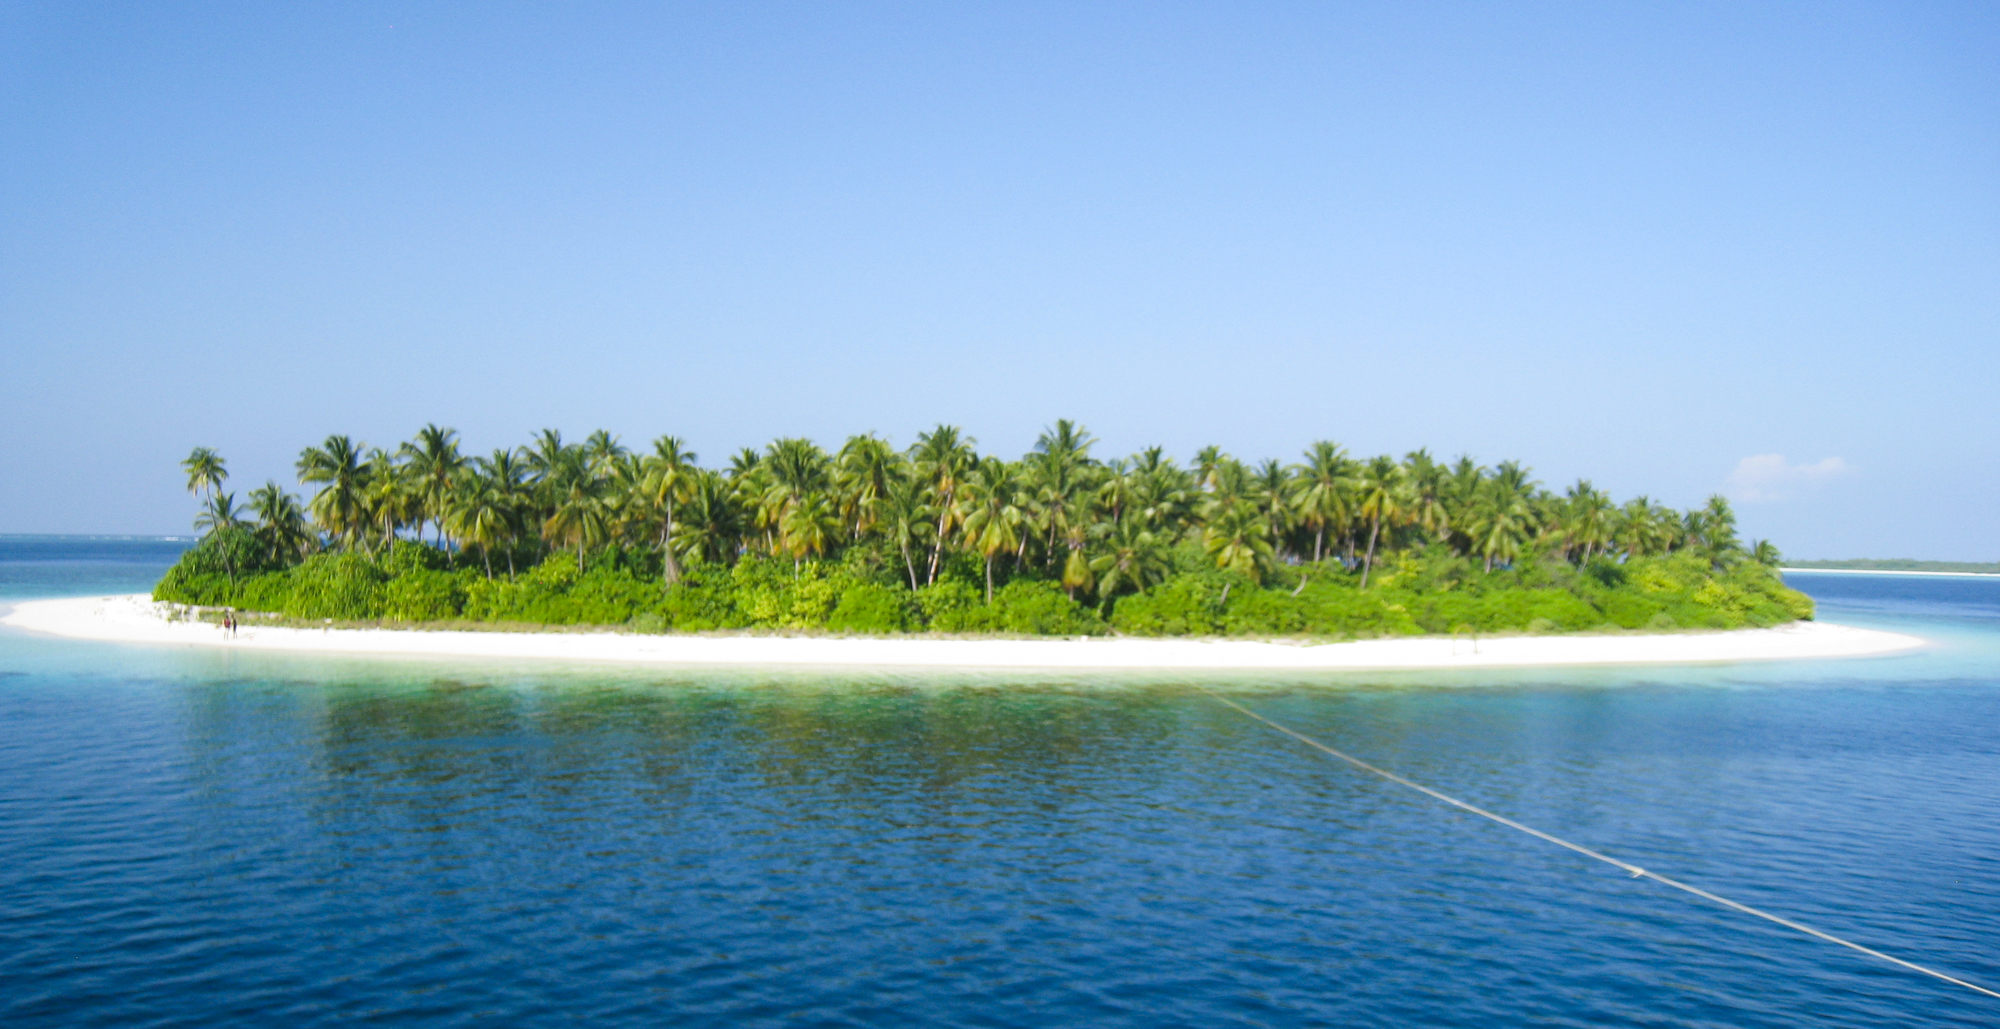 Malediven_Tauchsafari_Zwei Wochen_Weihnachten_Südatolle_Horizon III-6